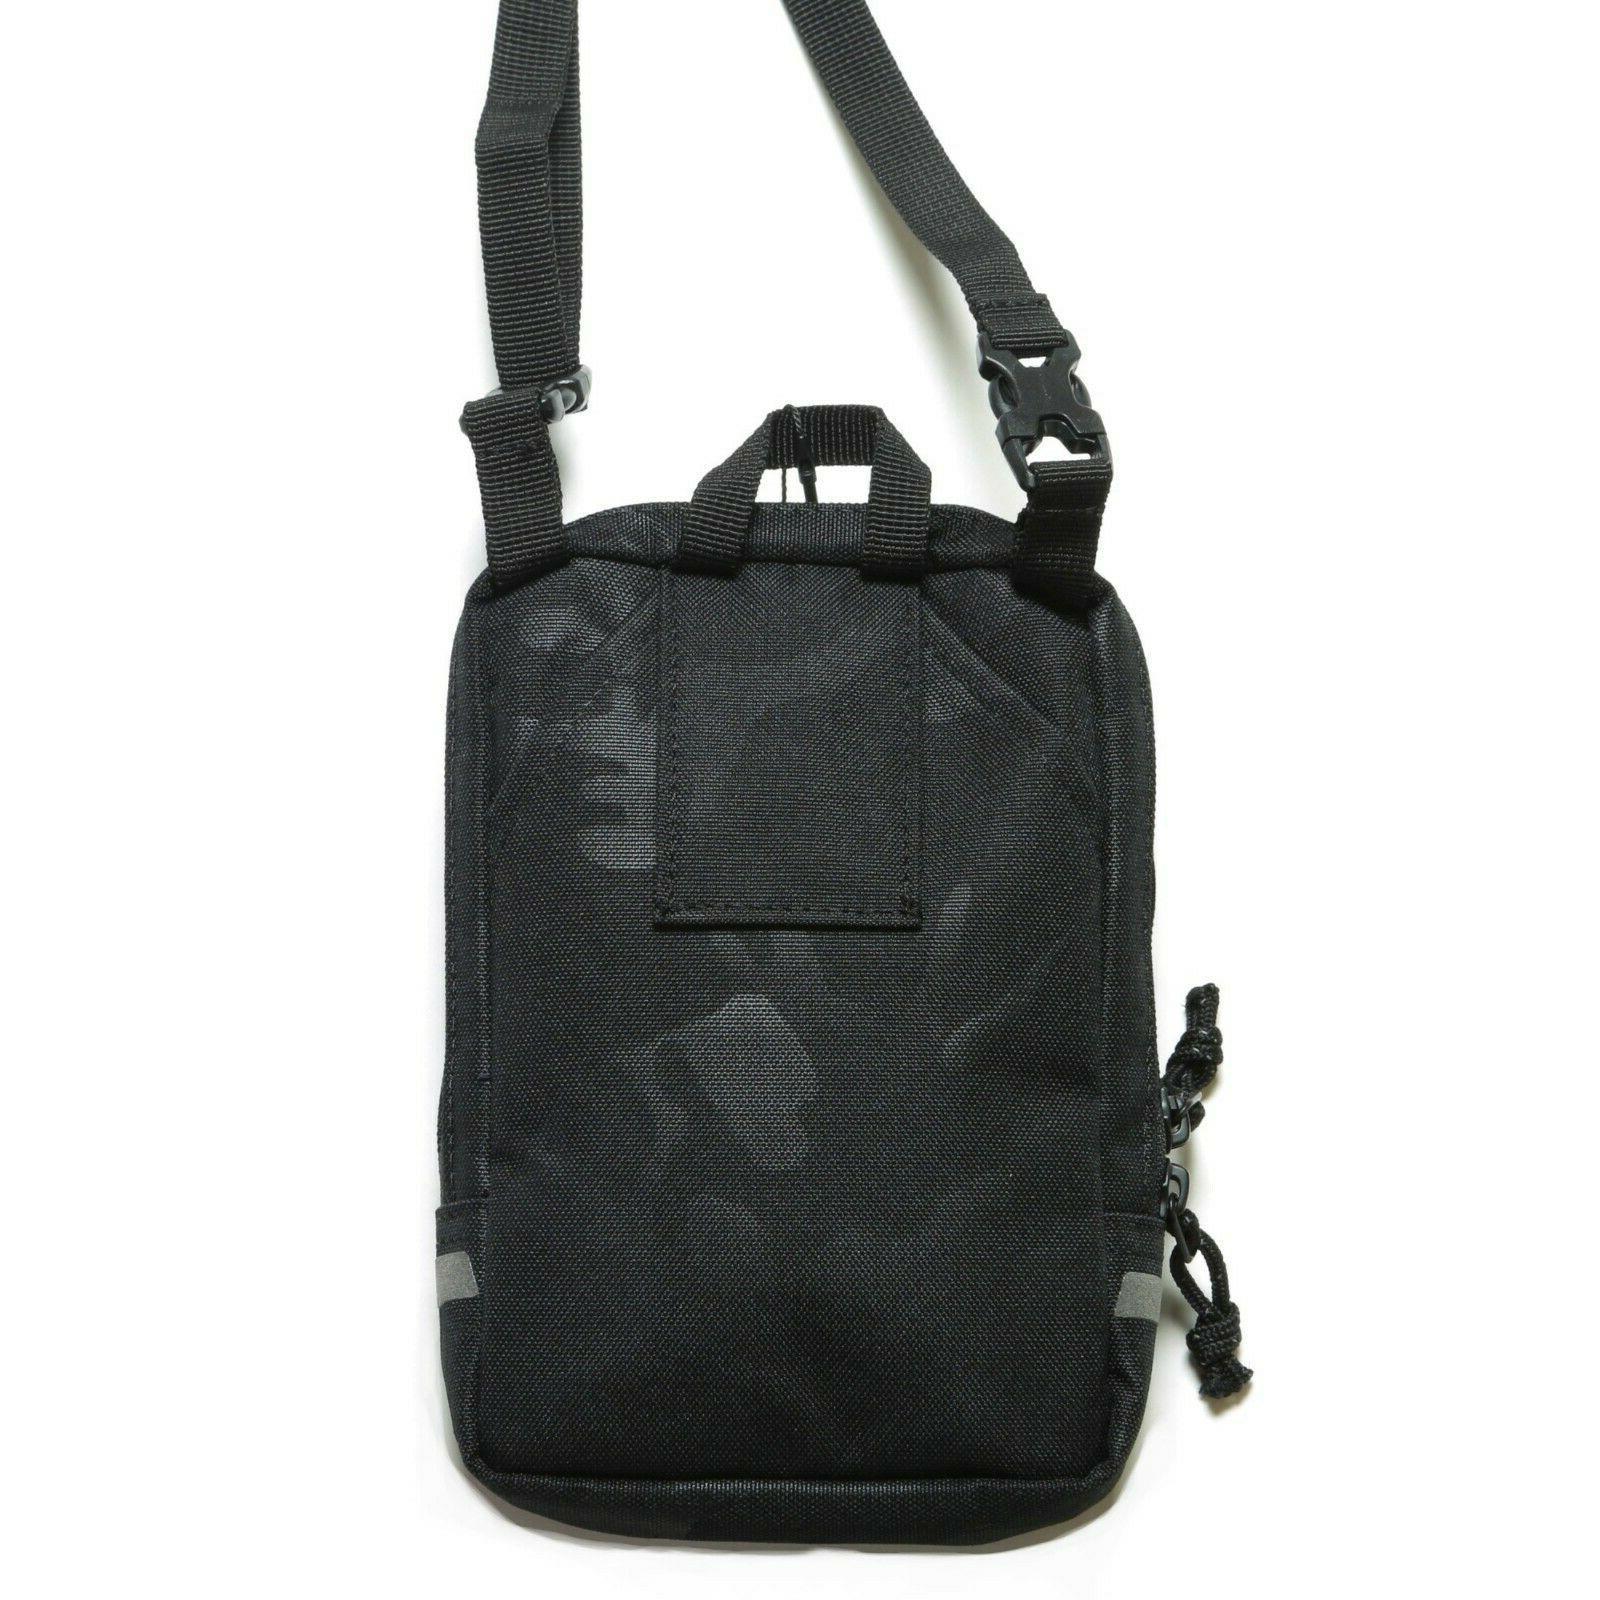 HERSCHEL SUPPLY CO Large Bag Black Camo